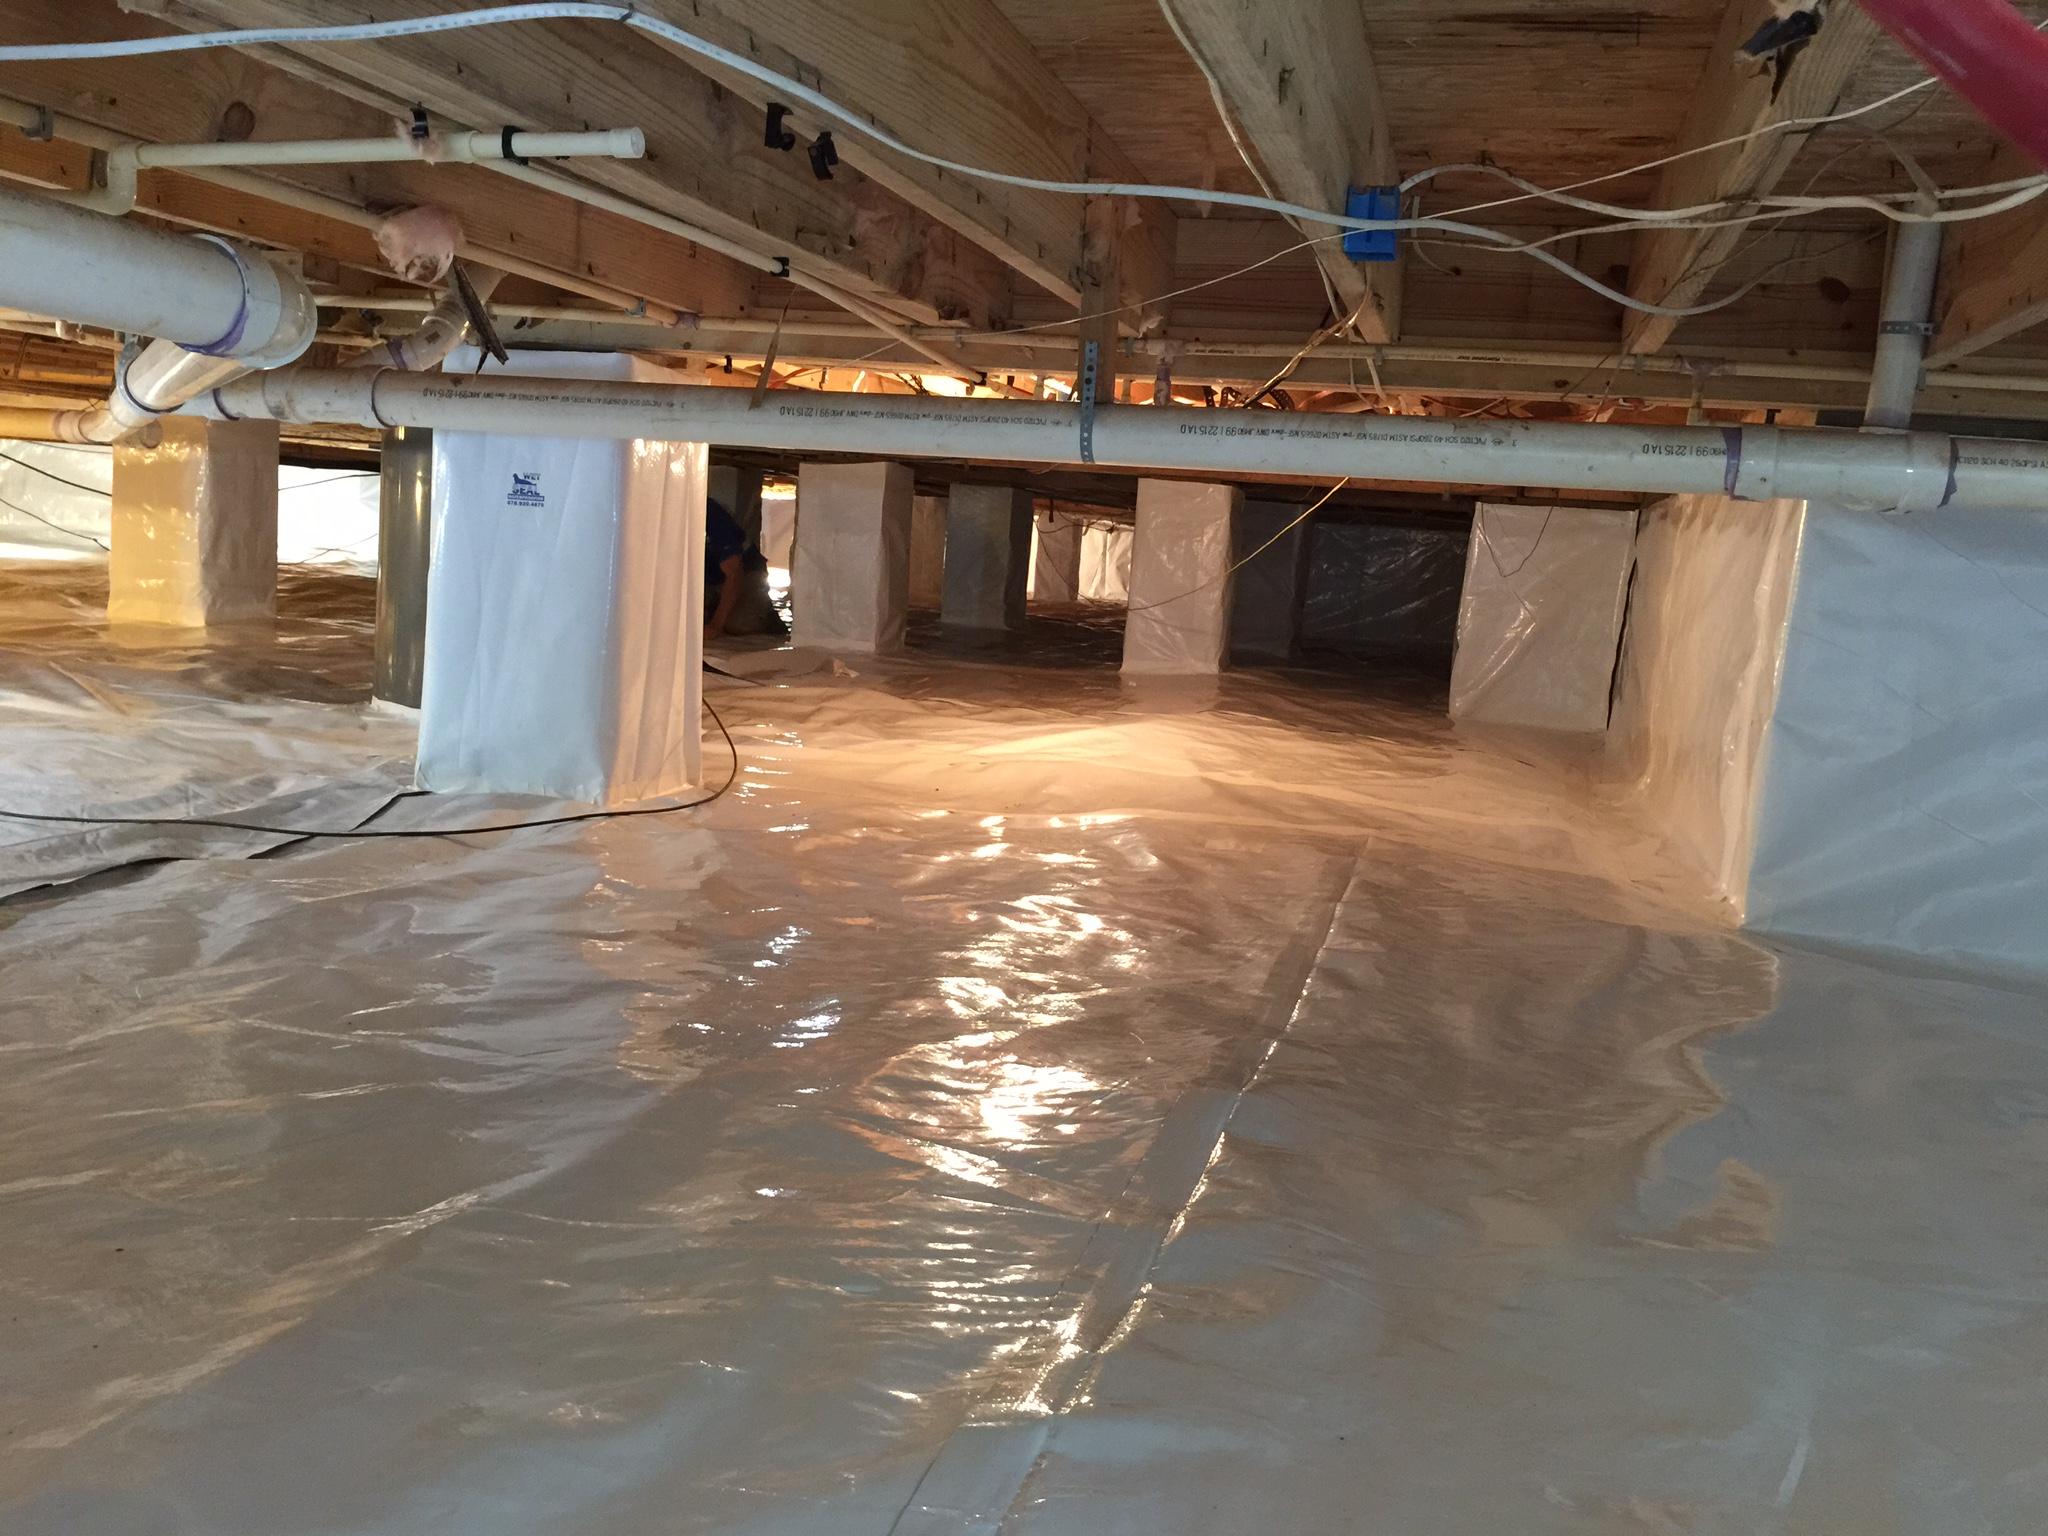 Crawl Space Waterproofing | Downers Grove, IL | Everdry Waterproofing Illinois